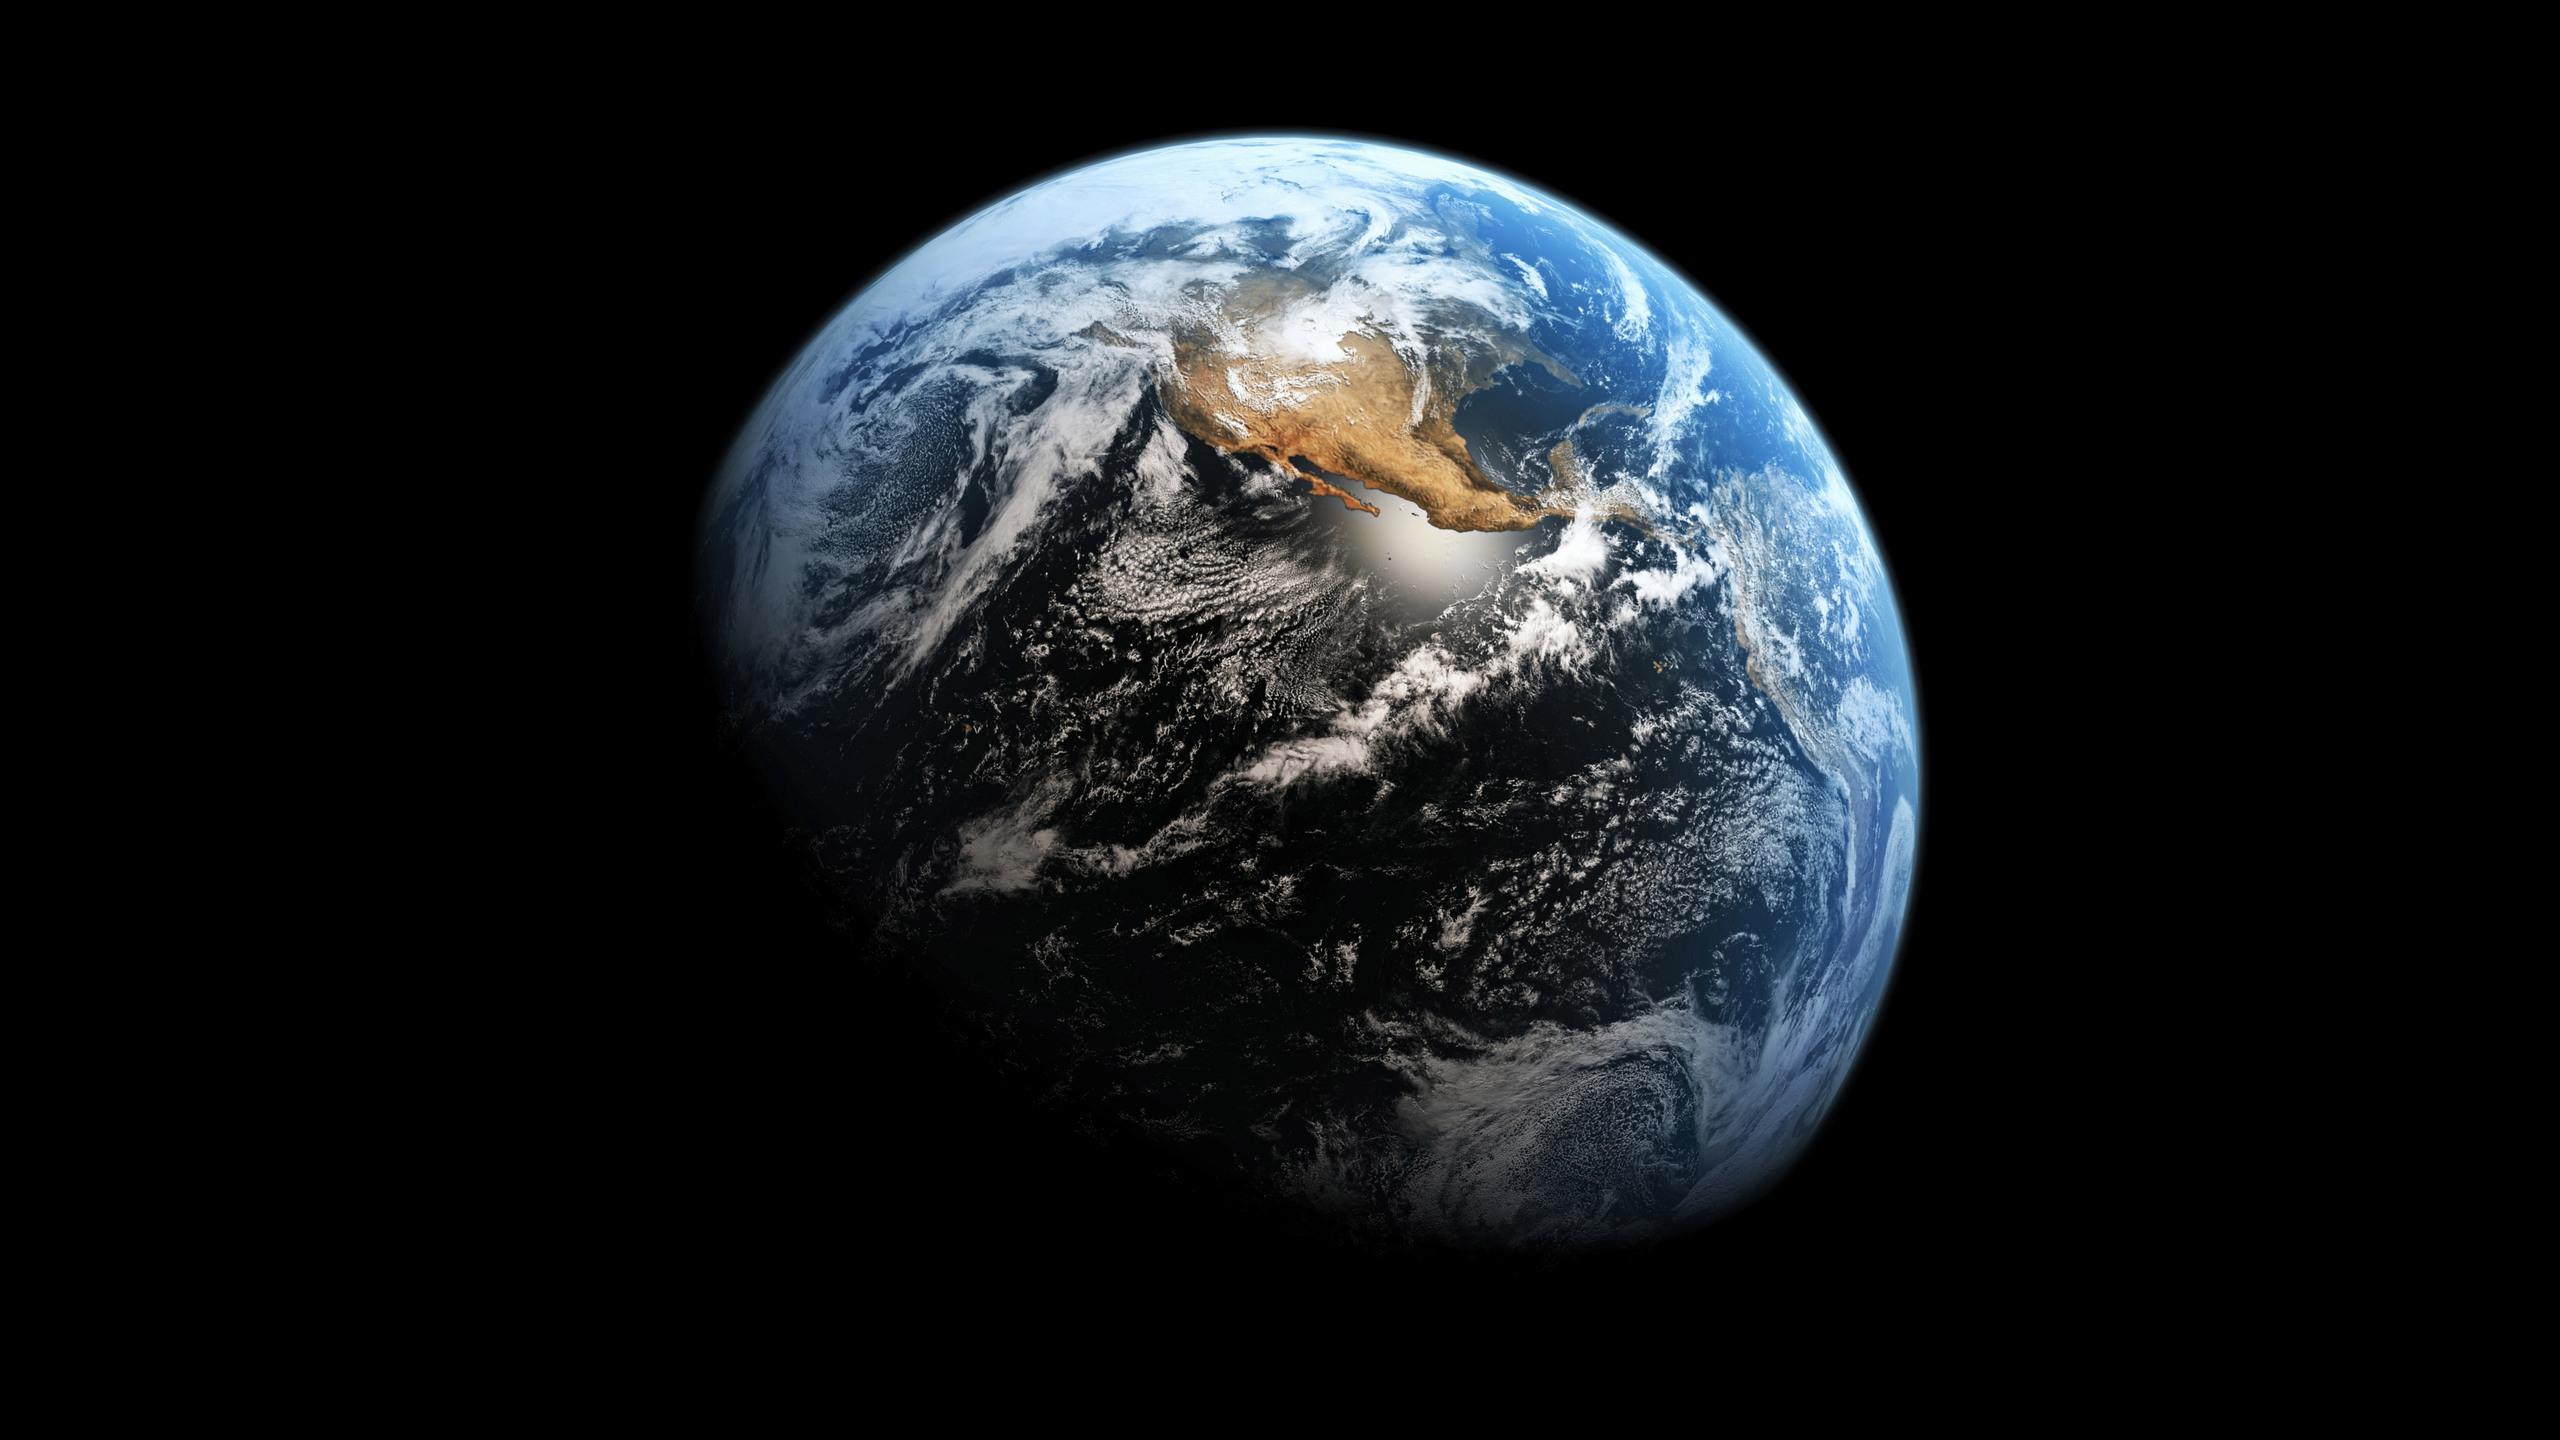 2560x1440 Earth Planet 4k 1440P Resolution HD 4k ...